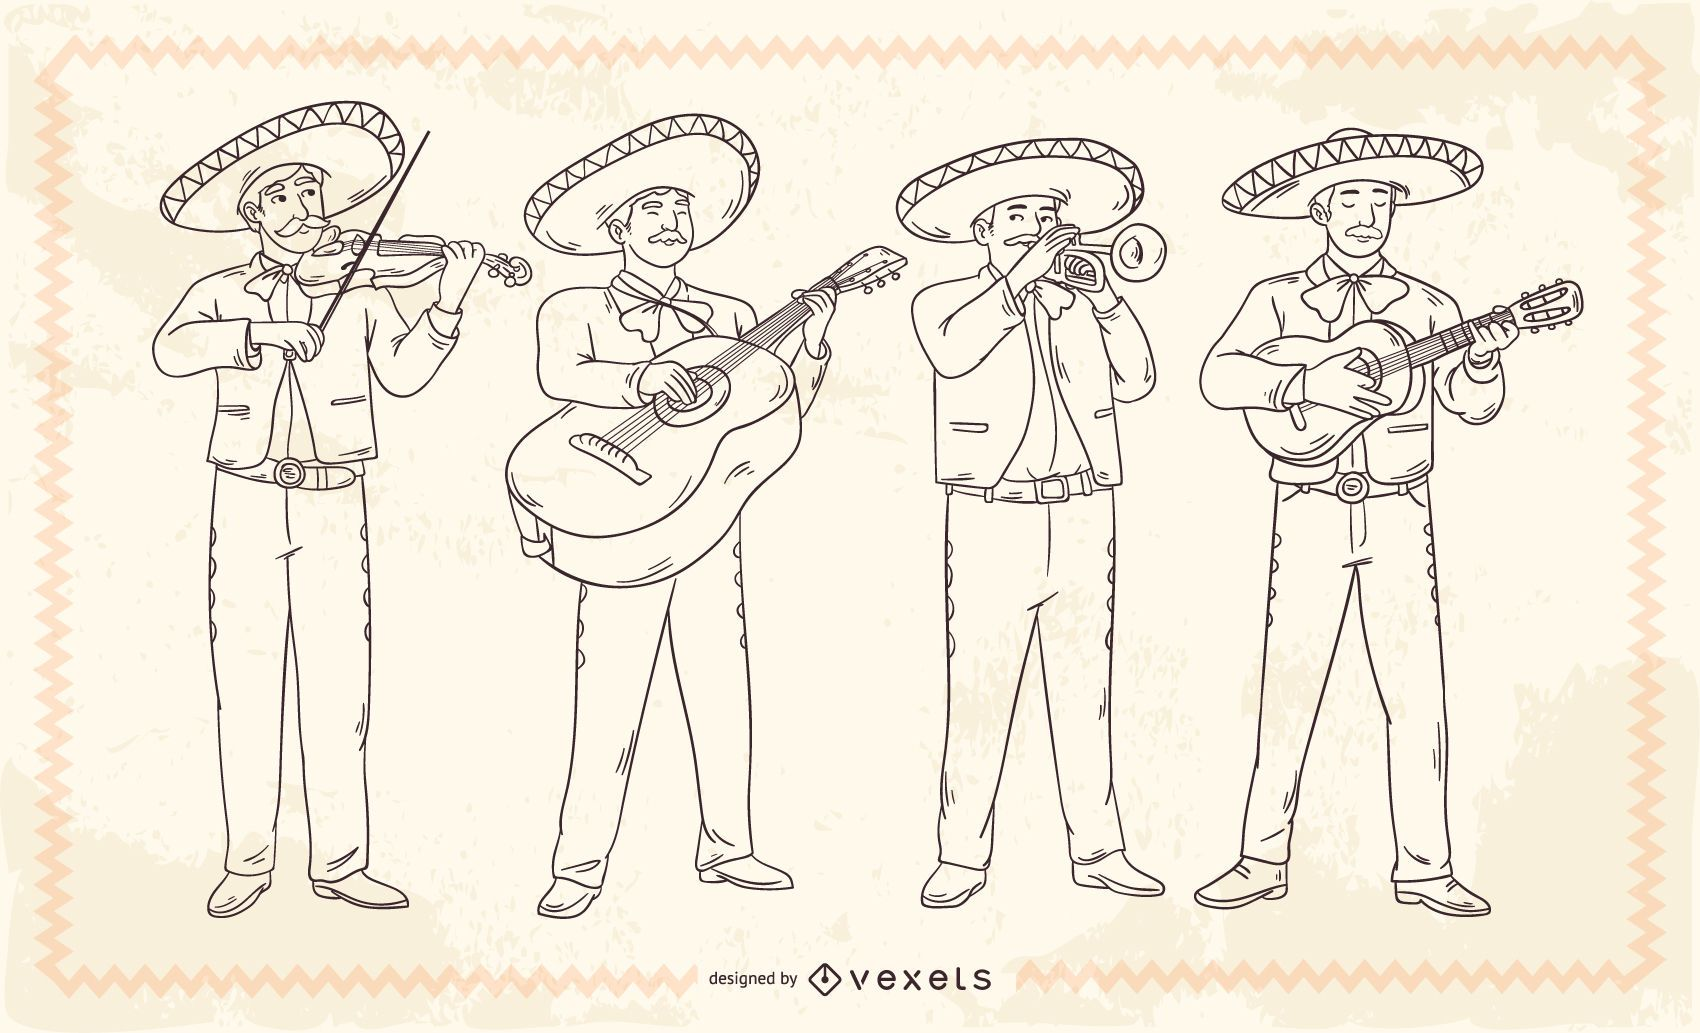 Personajes de trazo de mariachis mexicanos